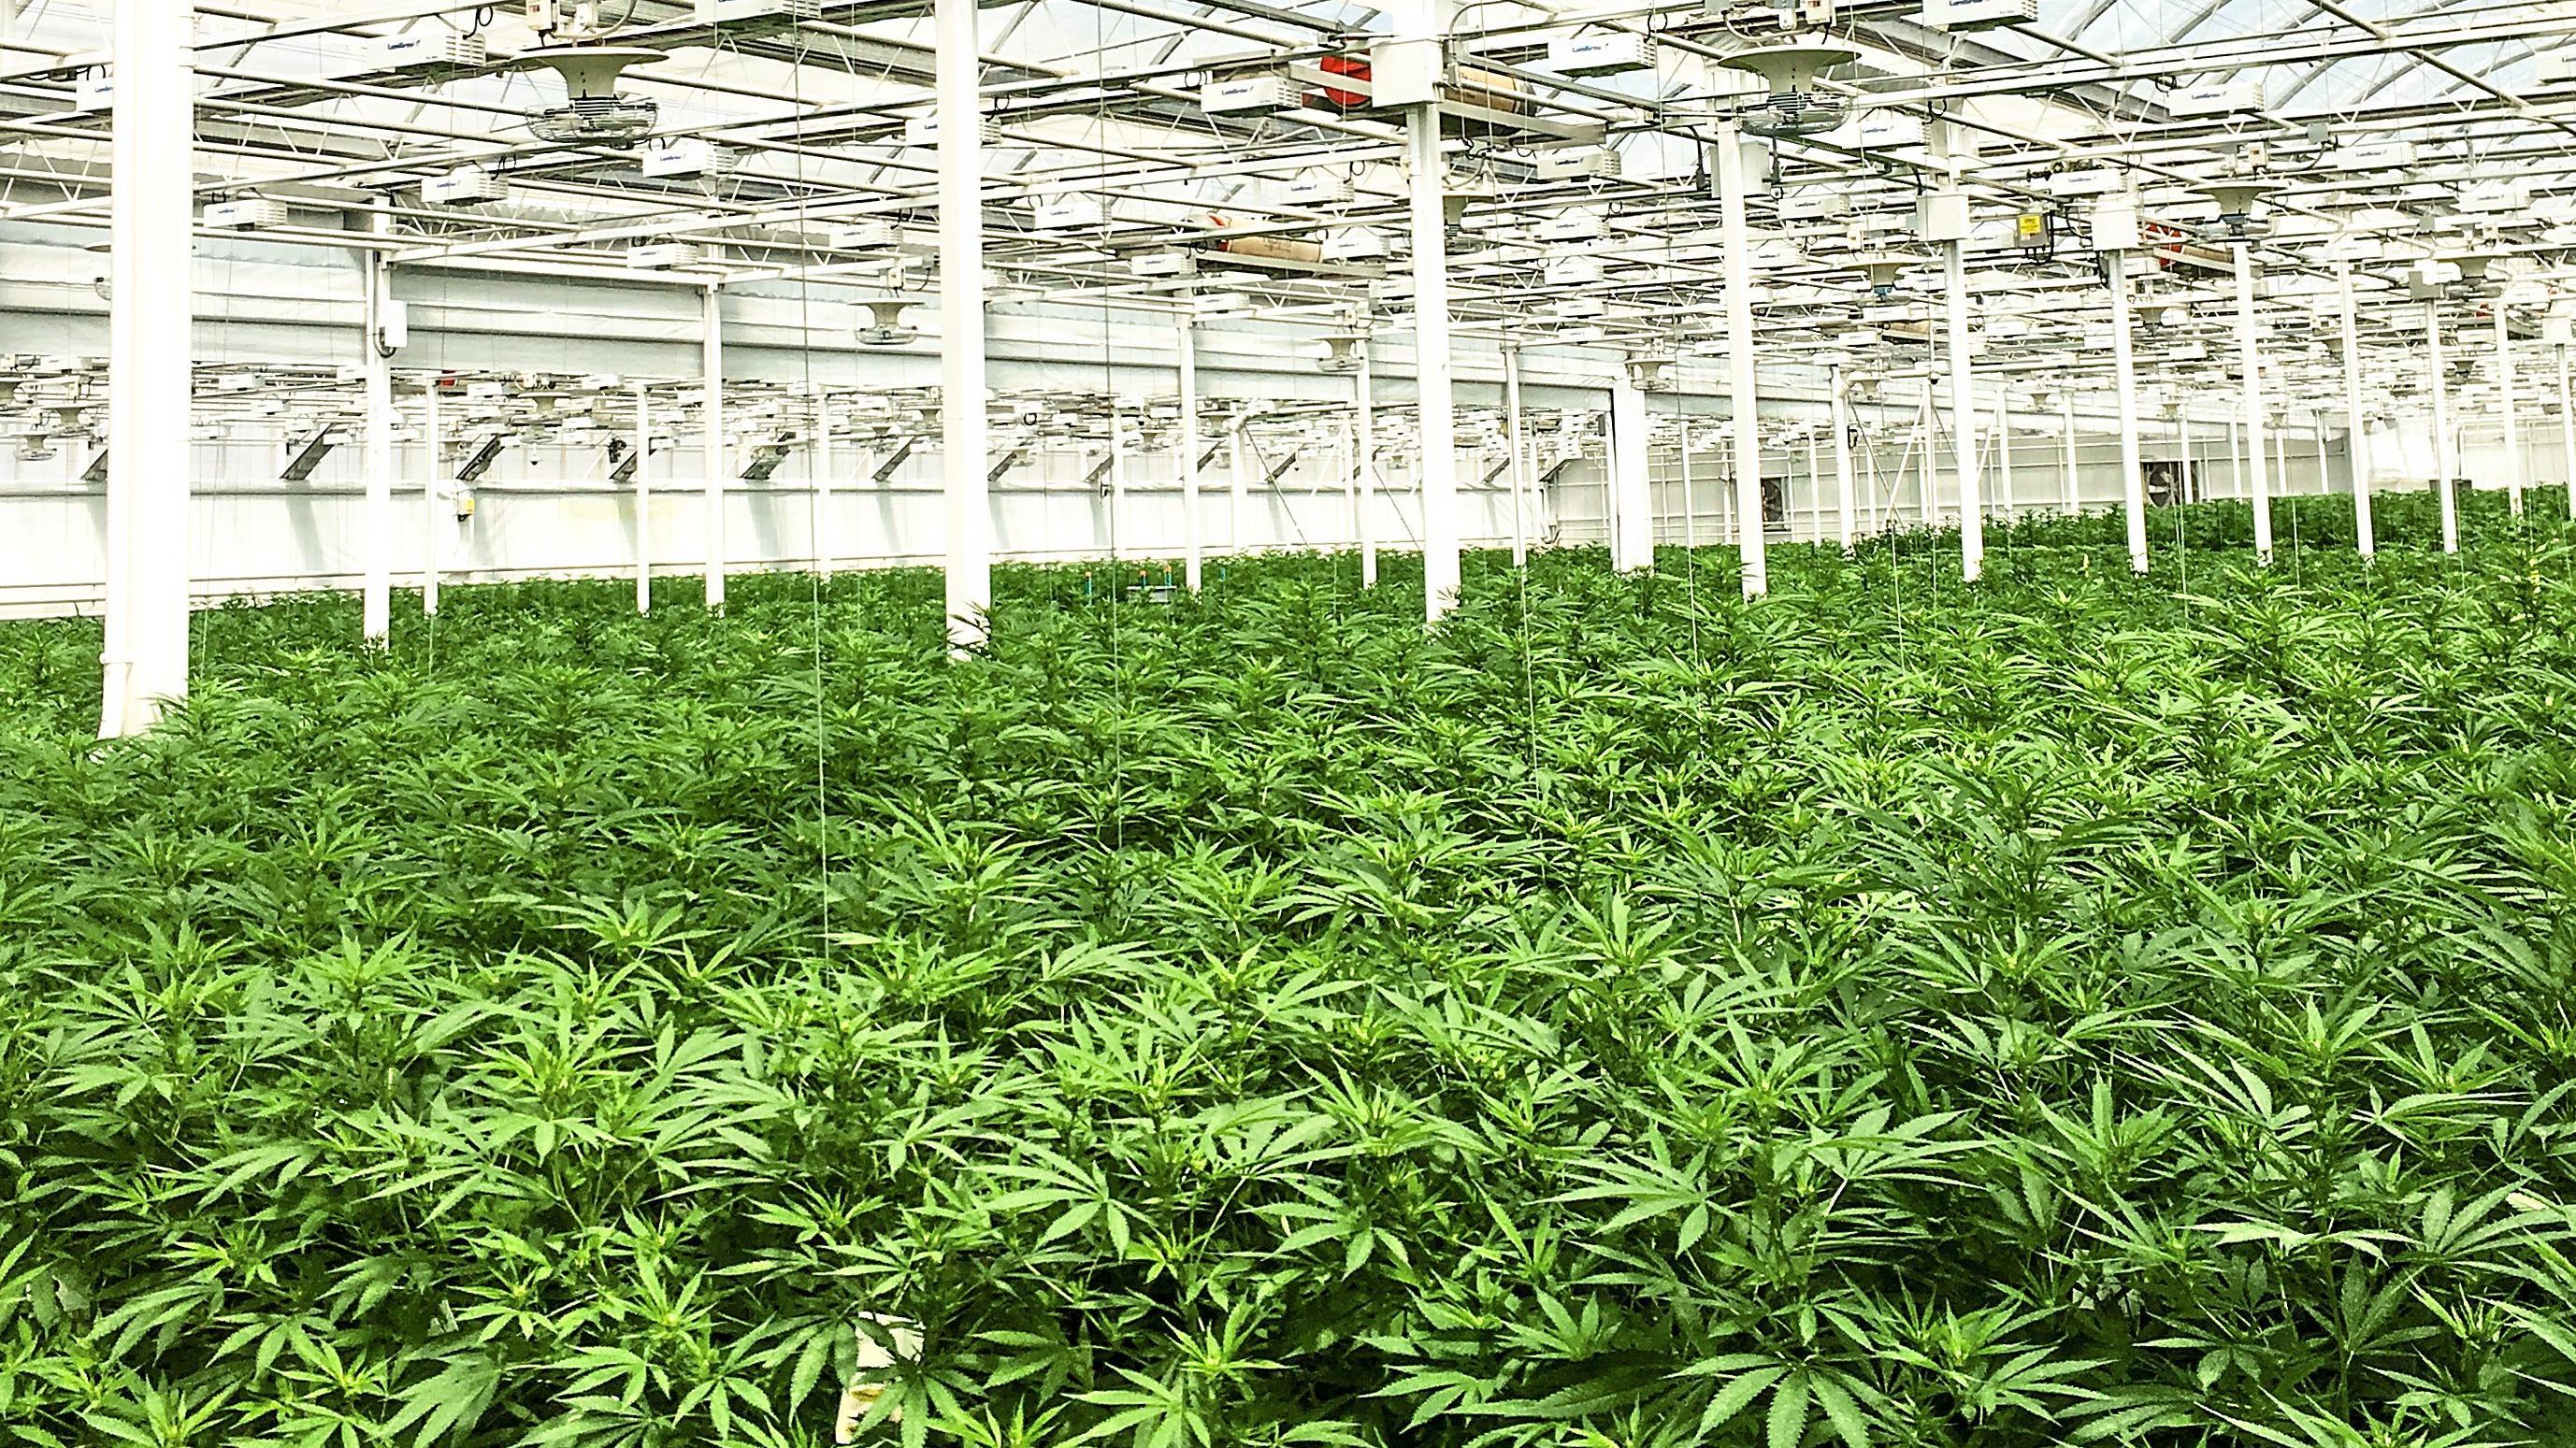 Kanada Legalisierung